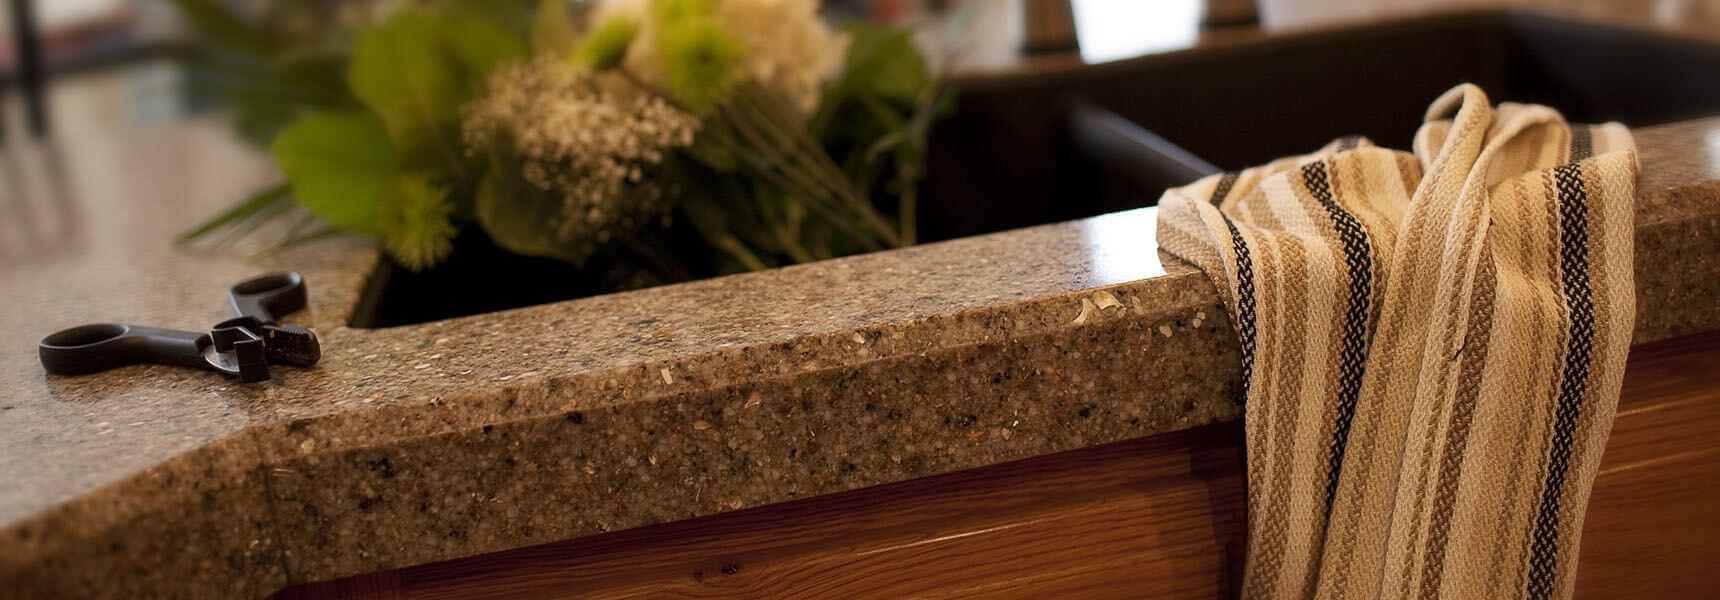 Lowes Stock Quote Clarkston Stone & Tilecountertops & Tile For Your Kitchen Bath